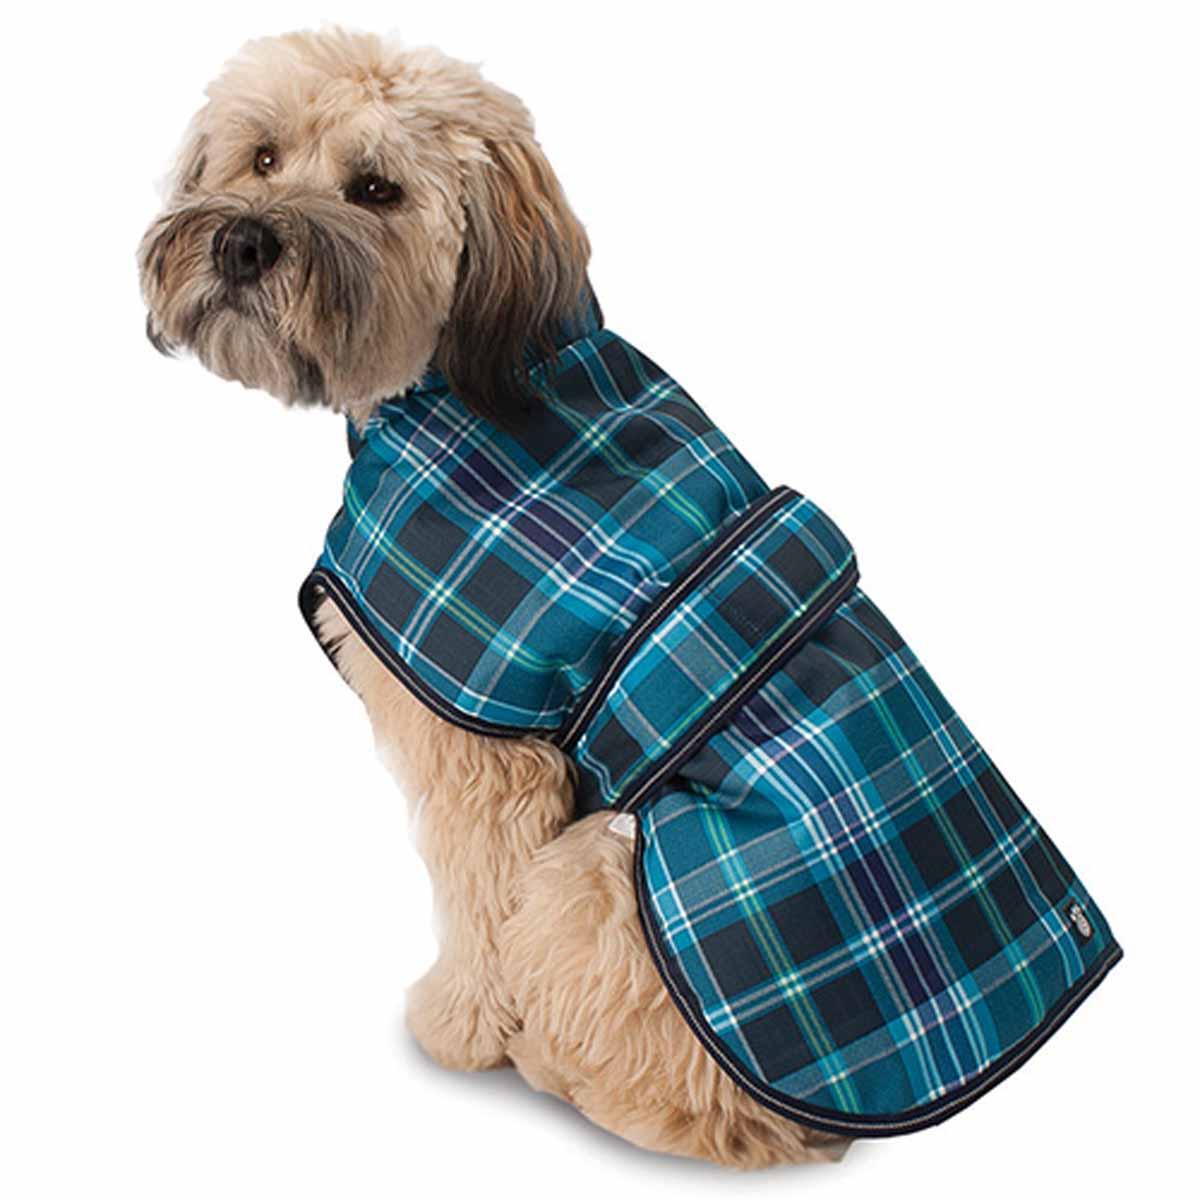 Kodiak Dog Coat - Teal Plaid